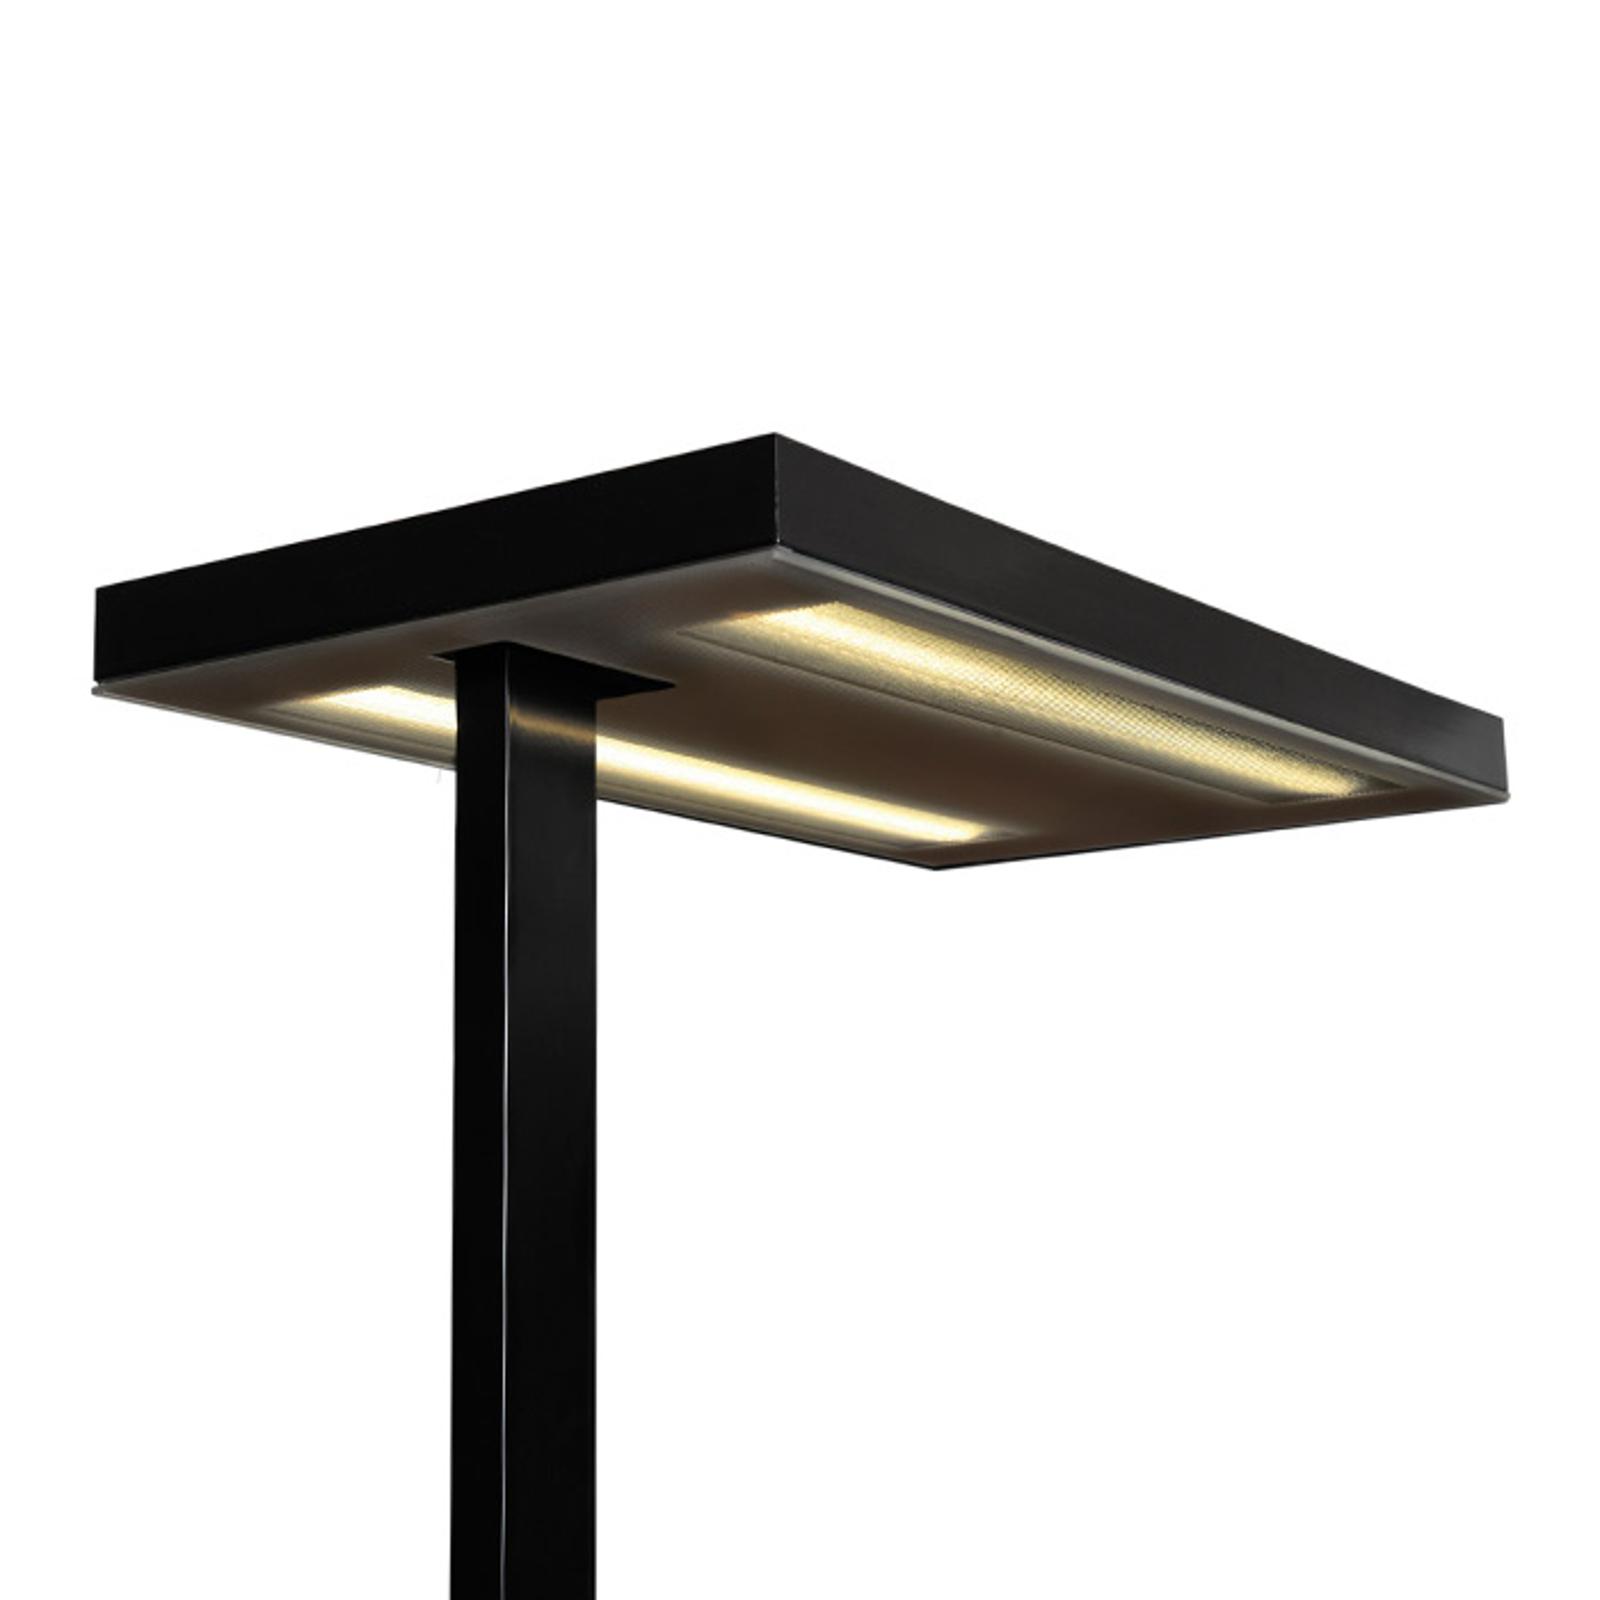 Kantoor vloerlamp Free-F Led 10000 HF 840 CP2 zw.